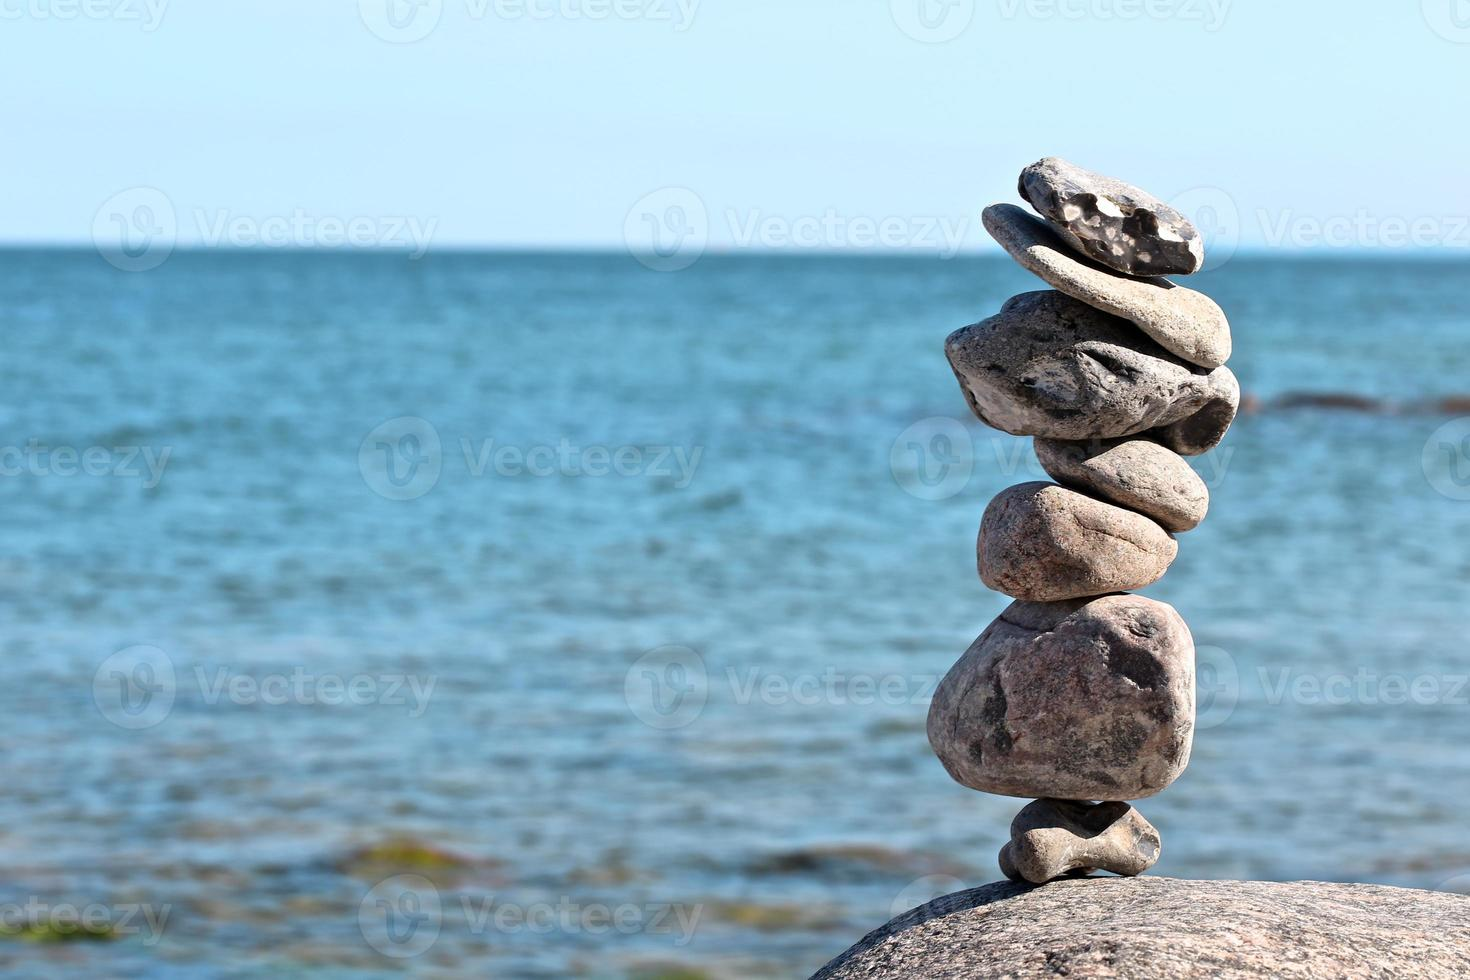 rochas zen com mar turva no fundo foto